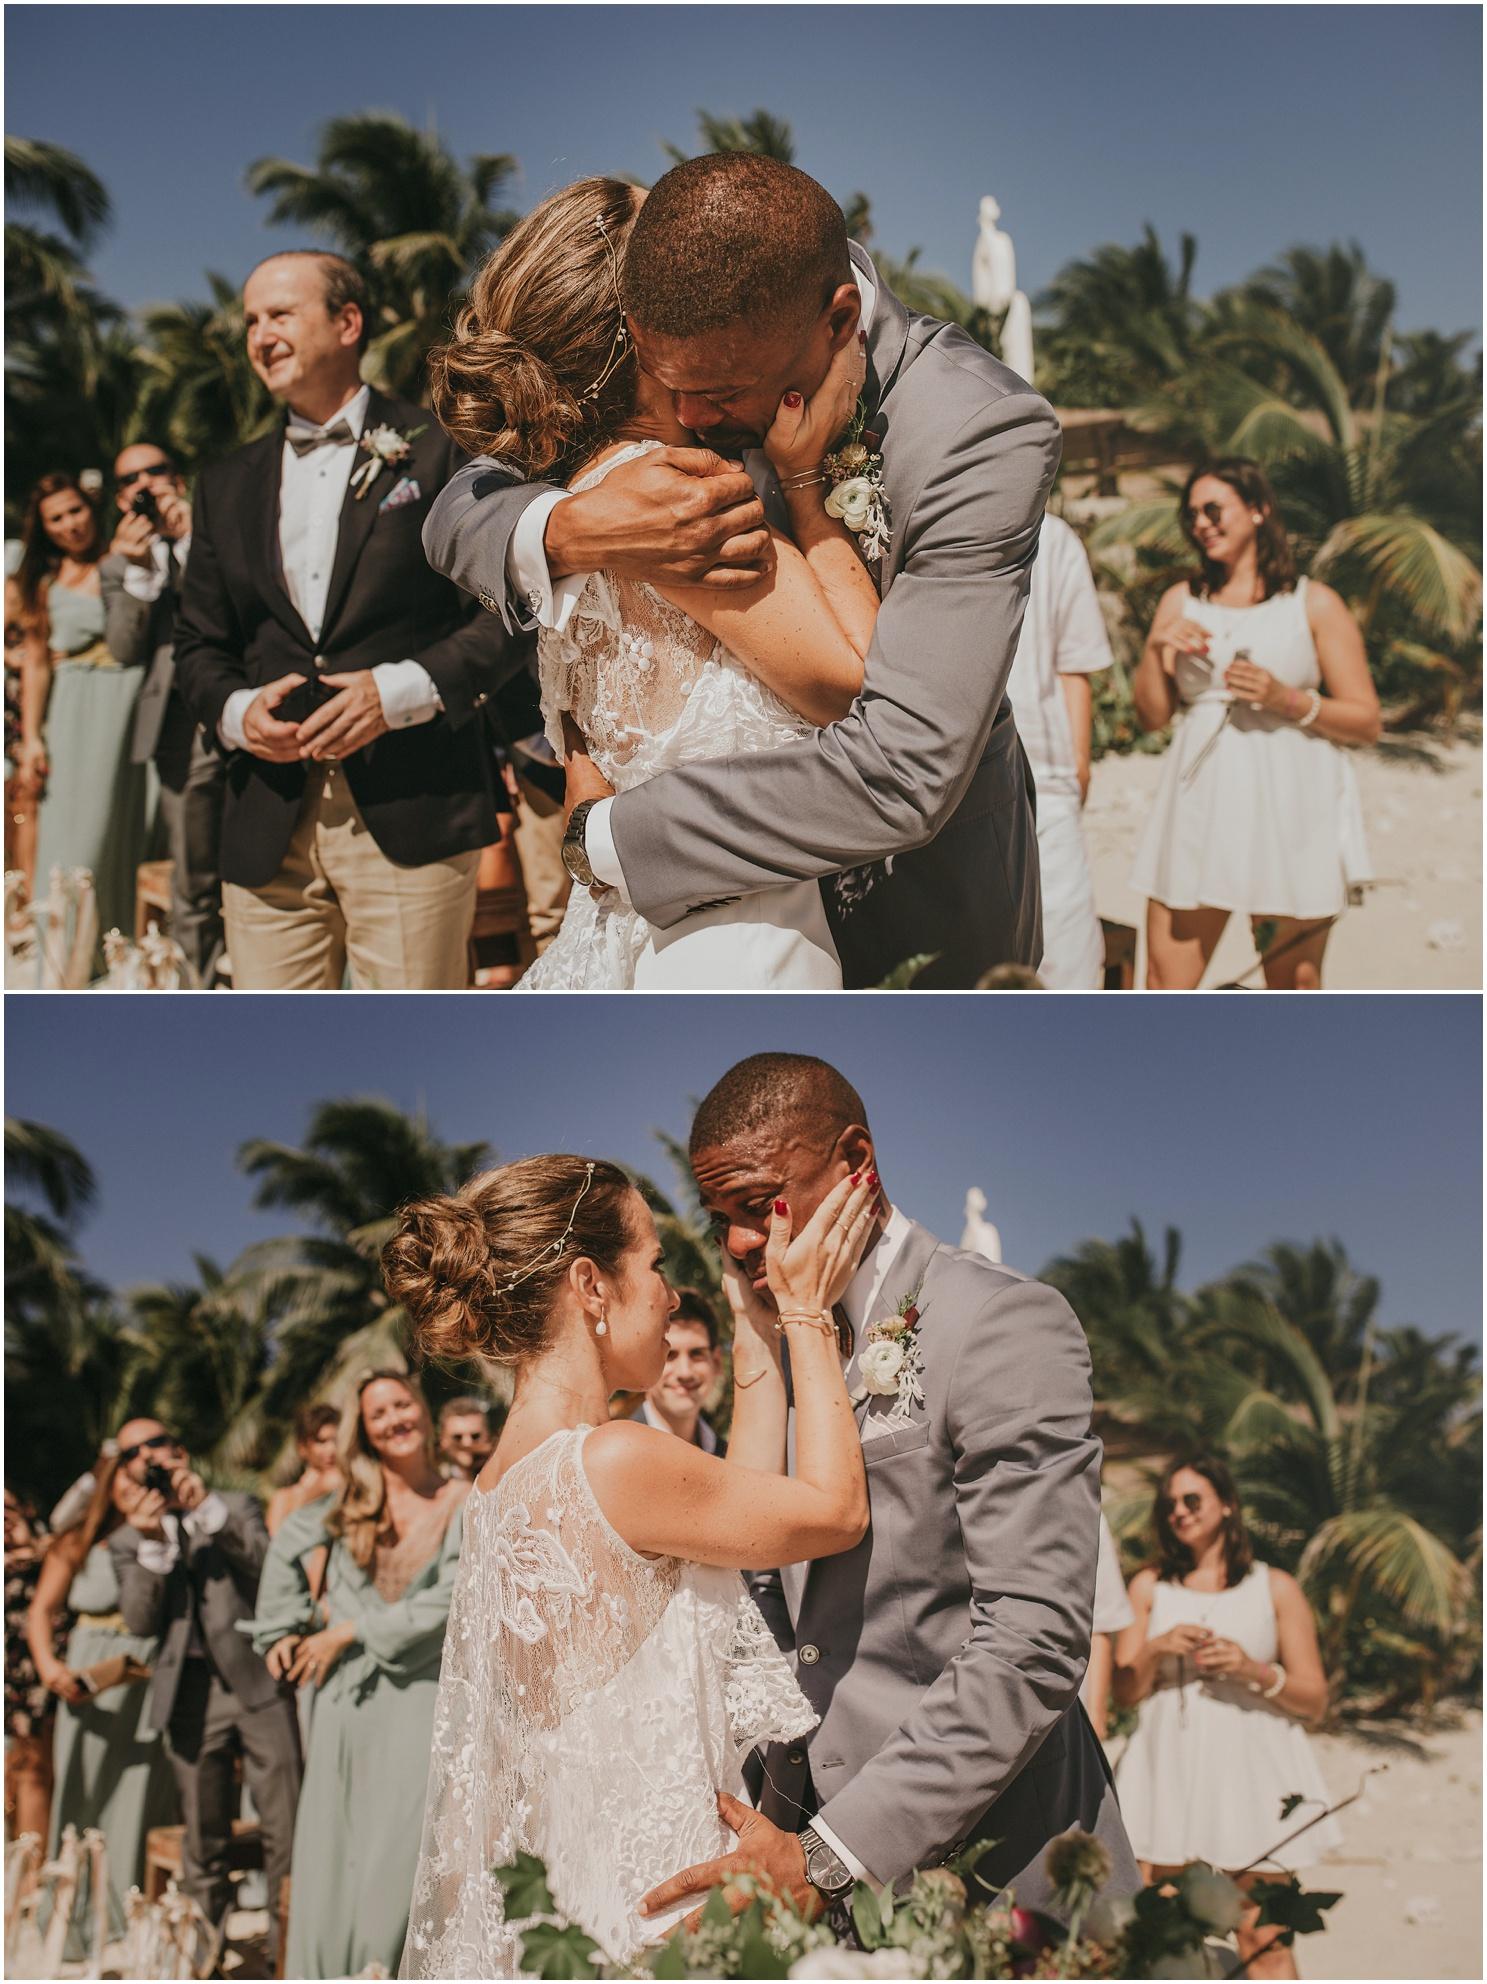 Pablo Laguia wedding photographer 070.jpg